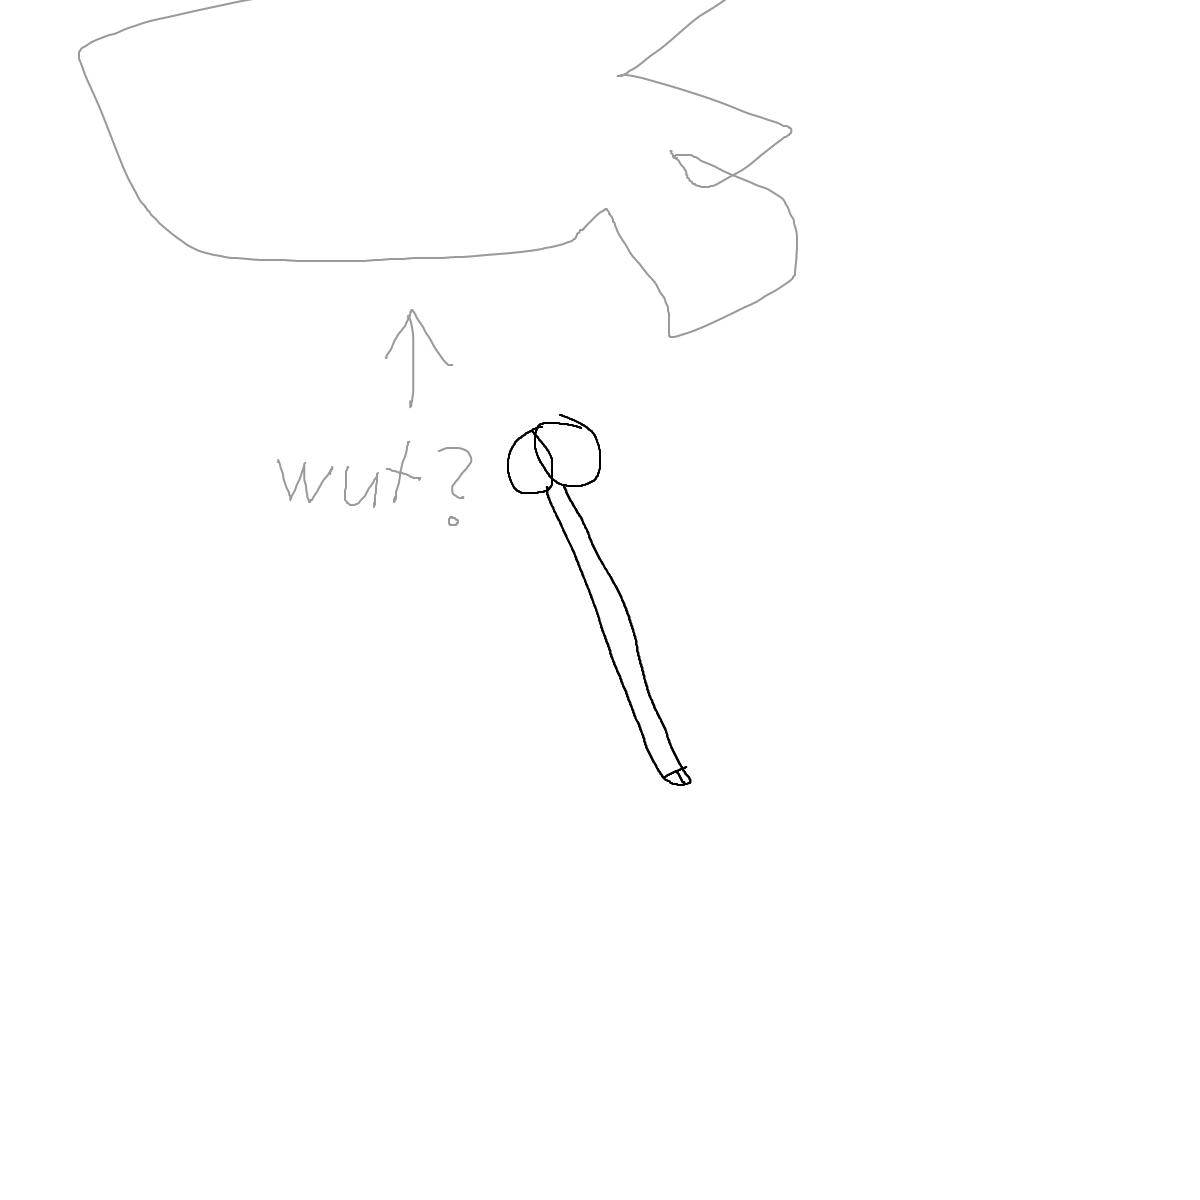 BAAAM drawing#274 lat:40.7131958007812500lng: -74.0122604370117200